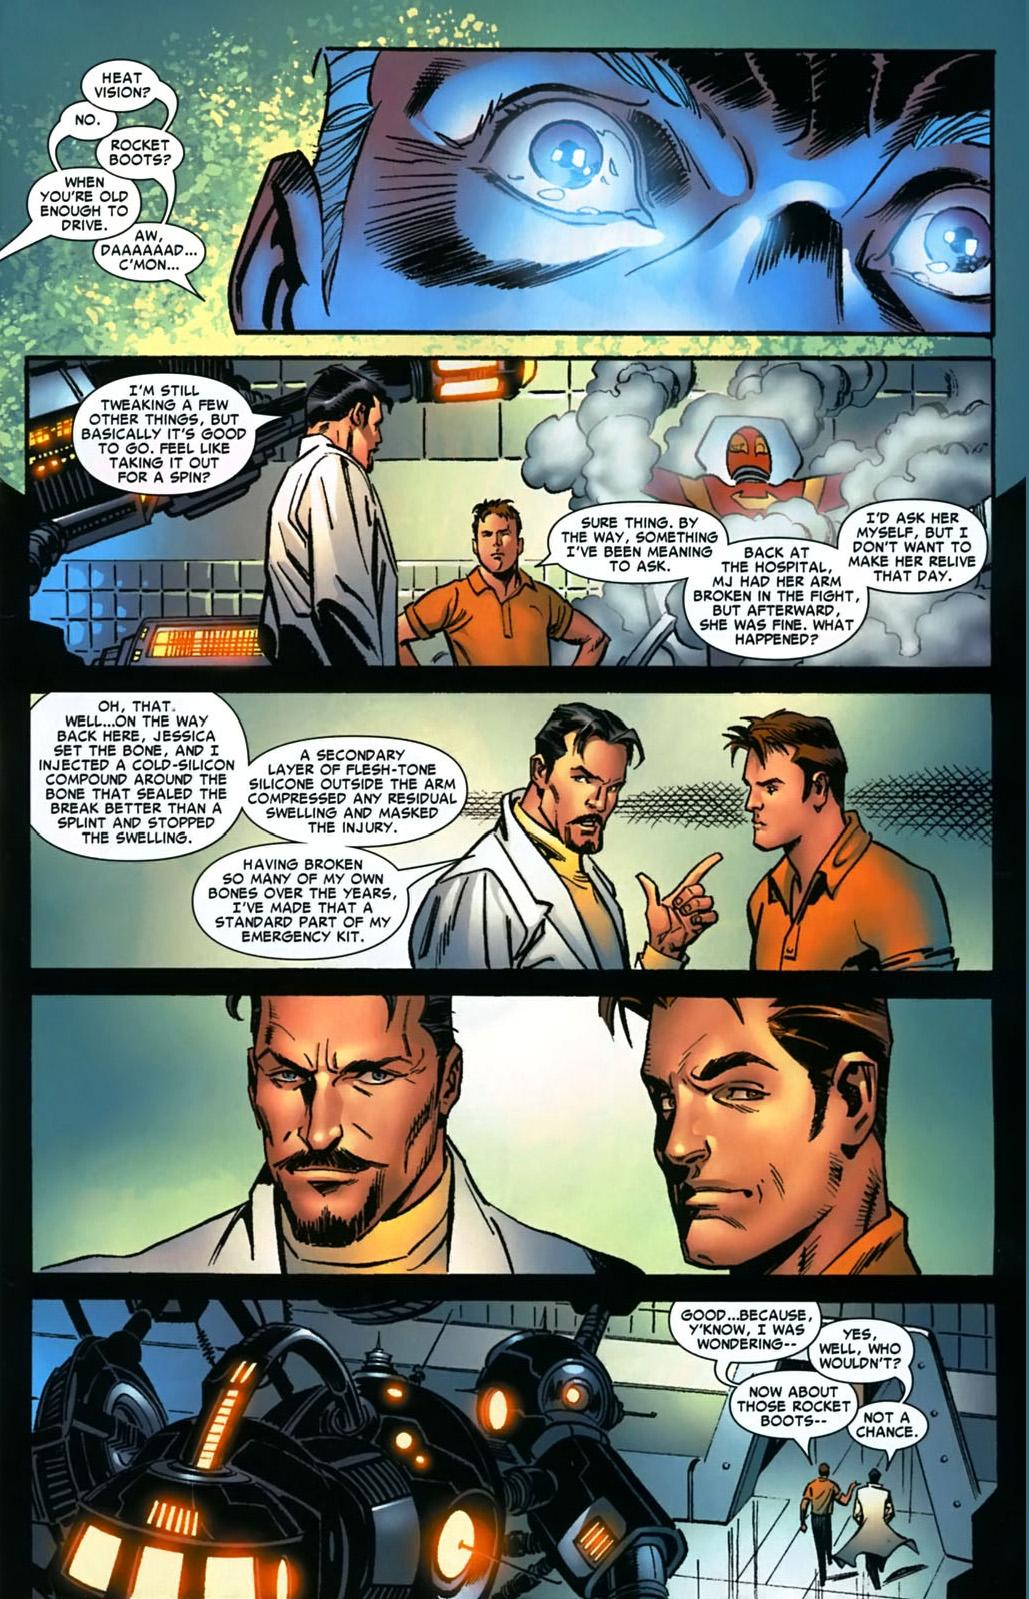 tony stark creates the iron spider suit